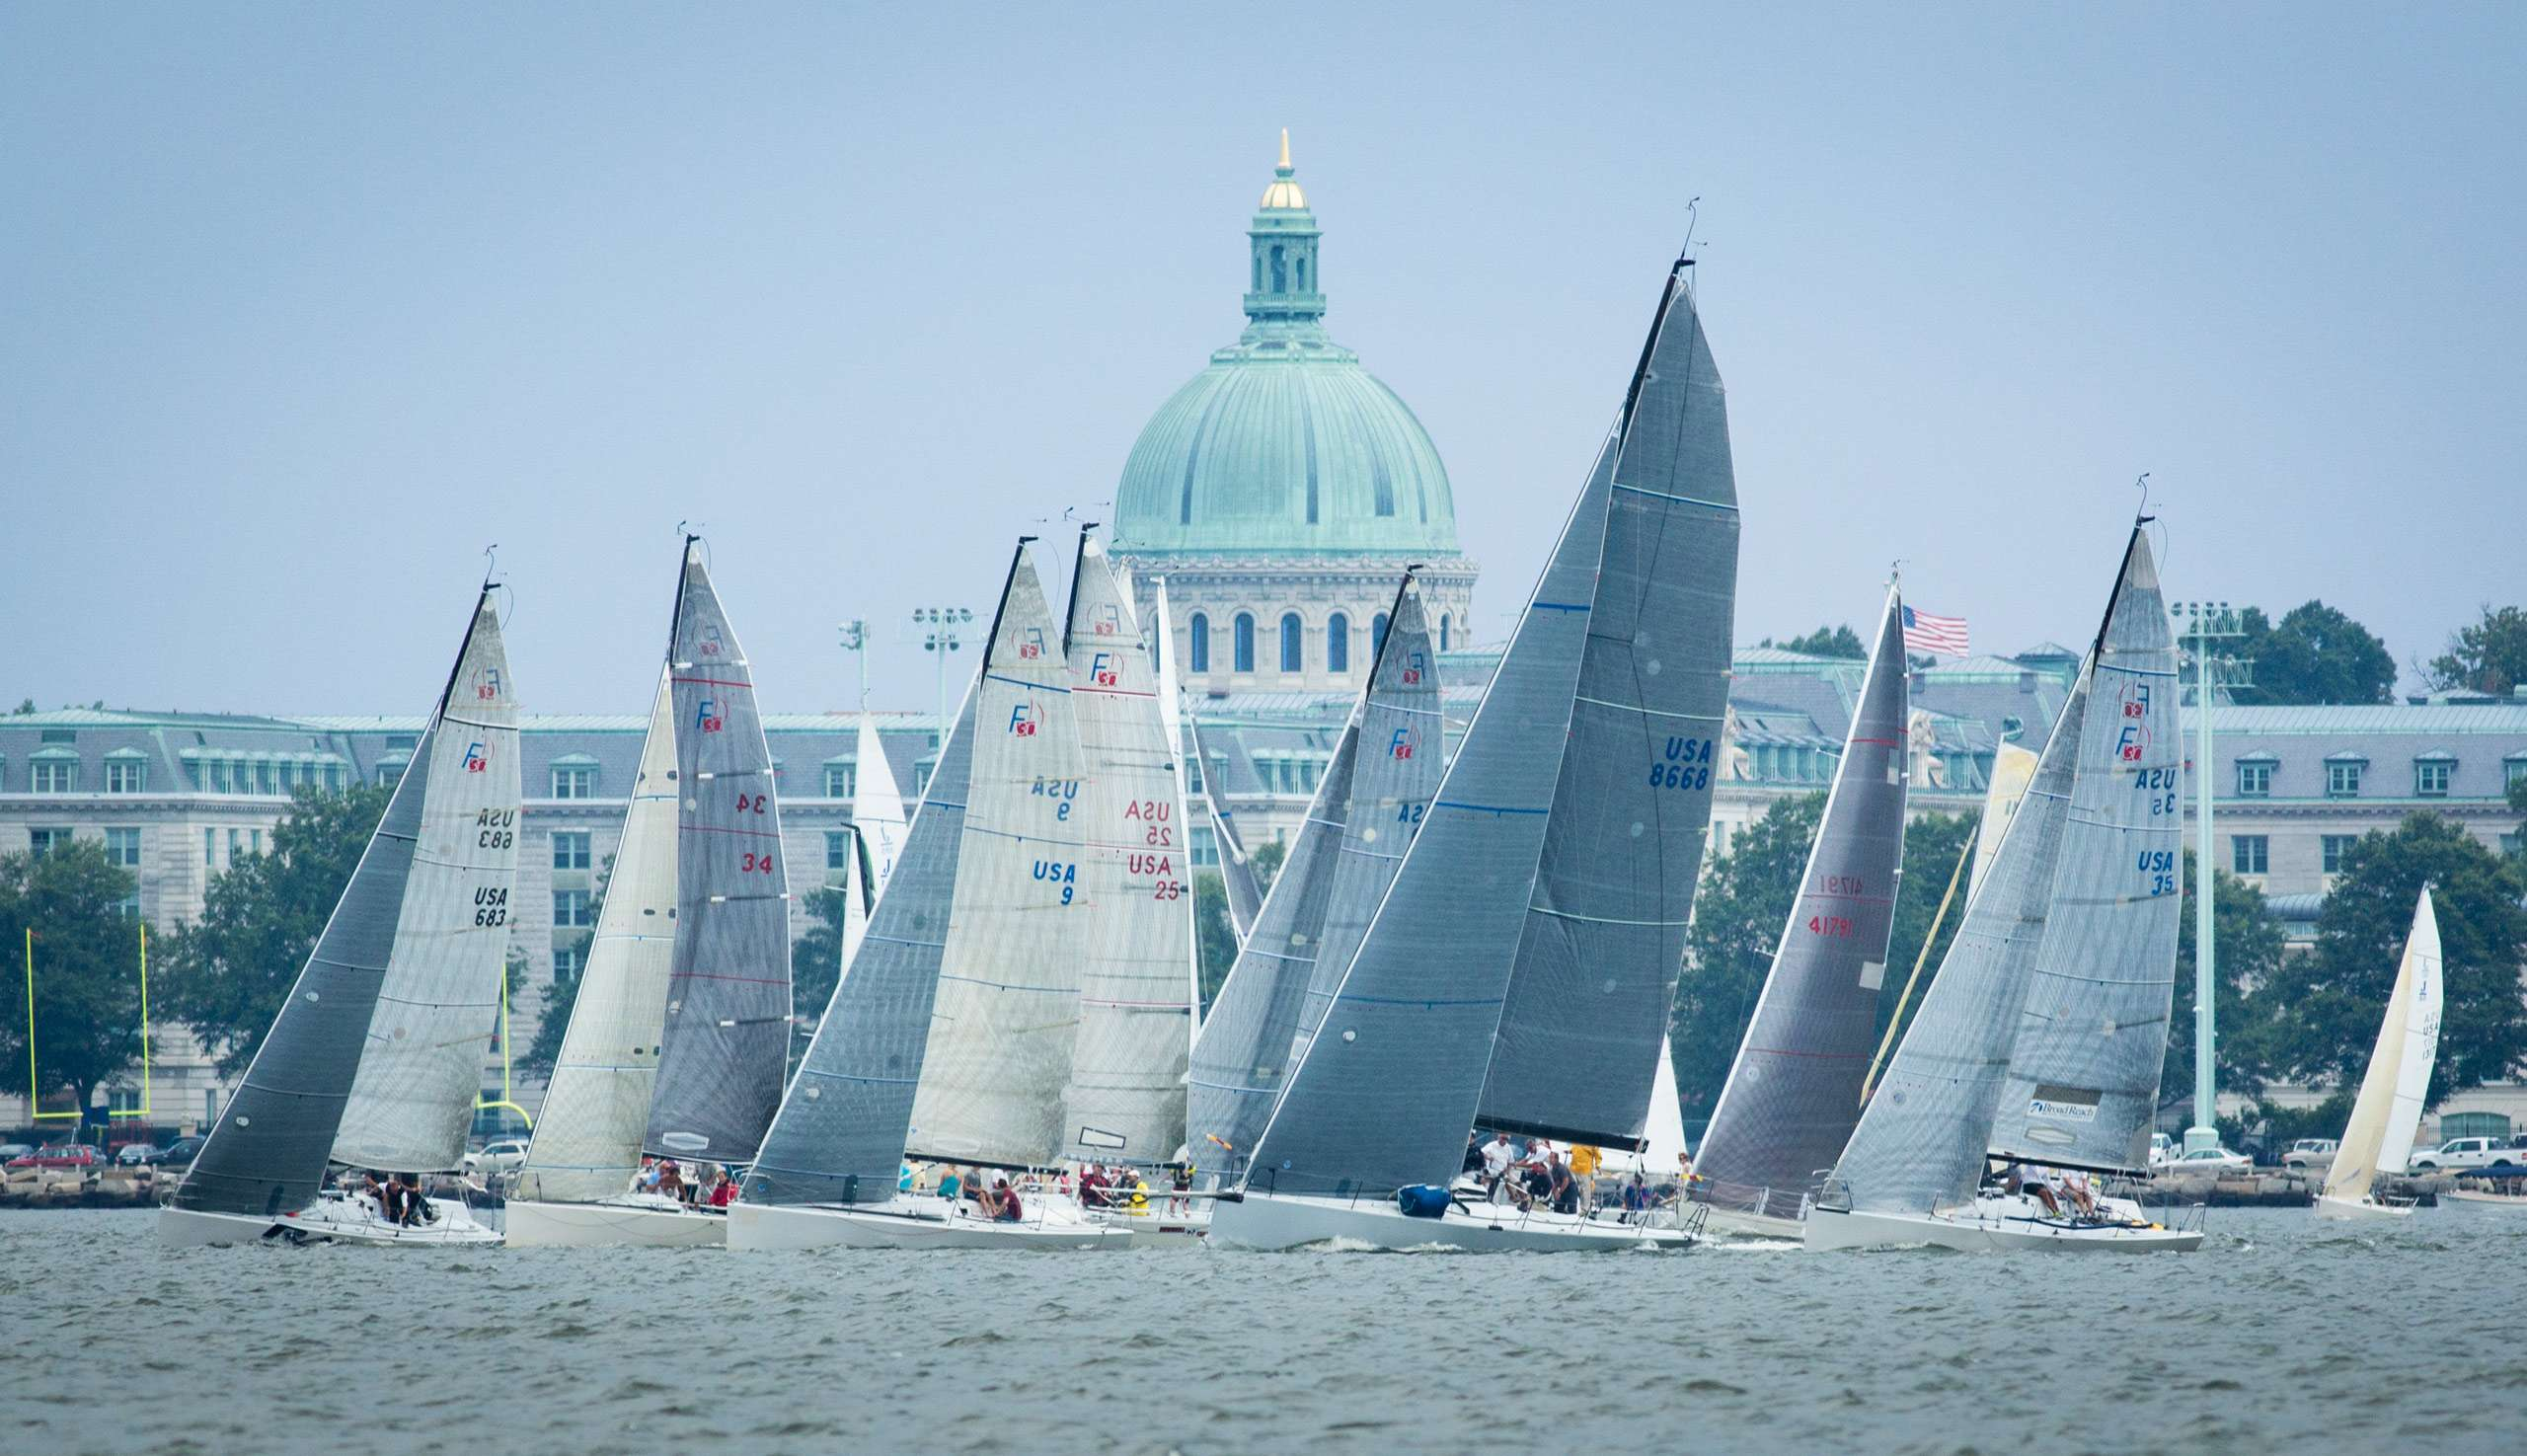 PORTFOLIO - Sailing - Chesapeake #10